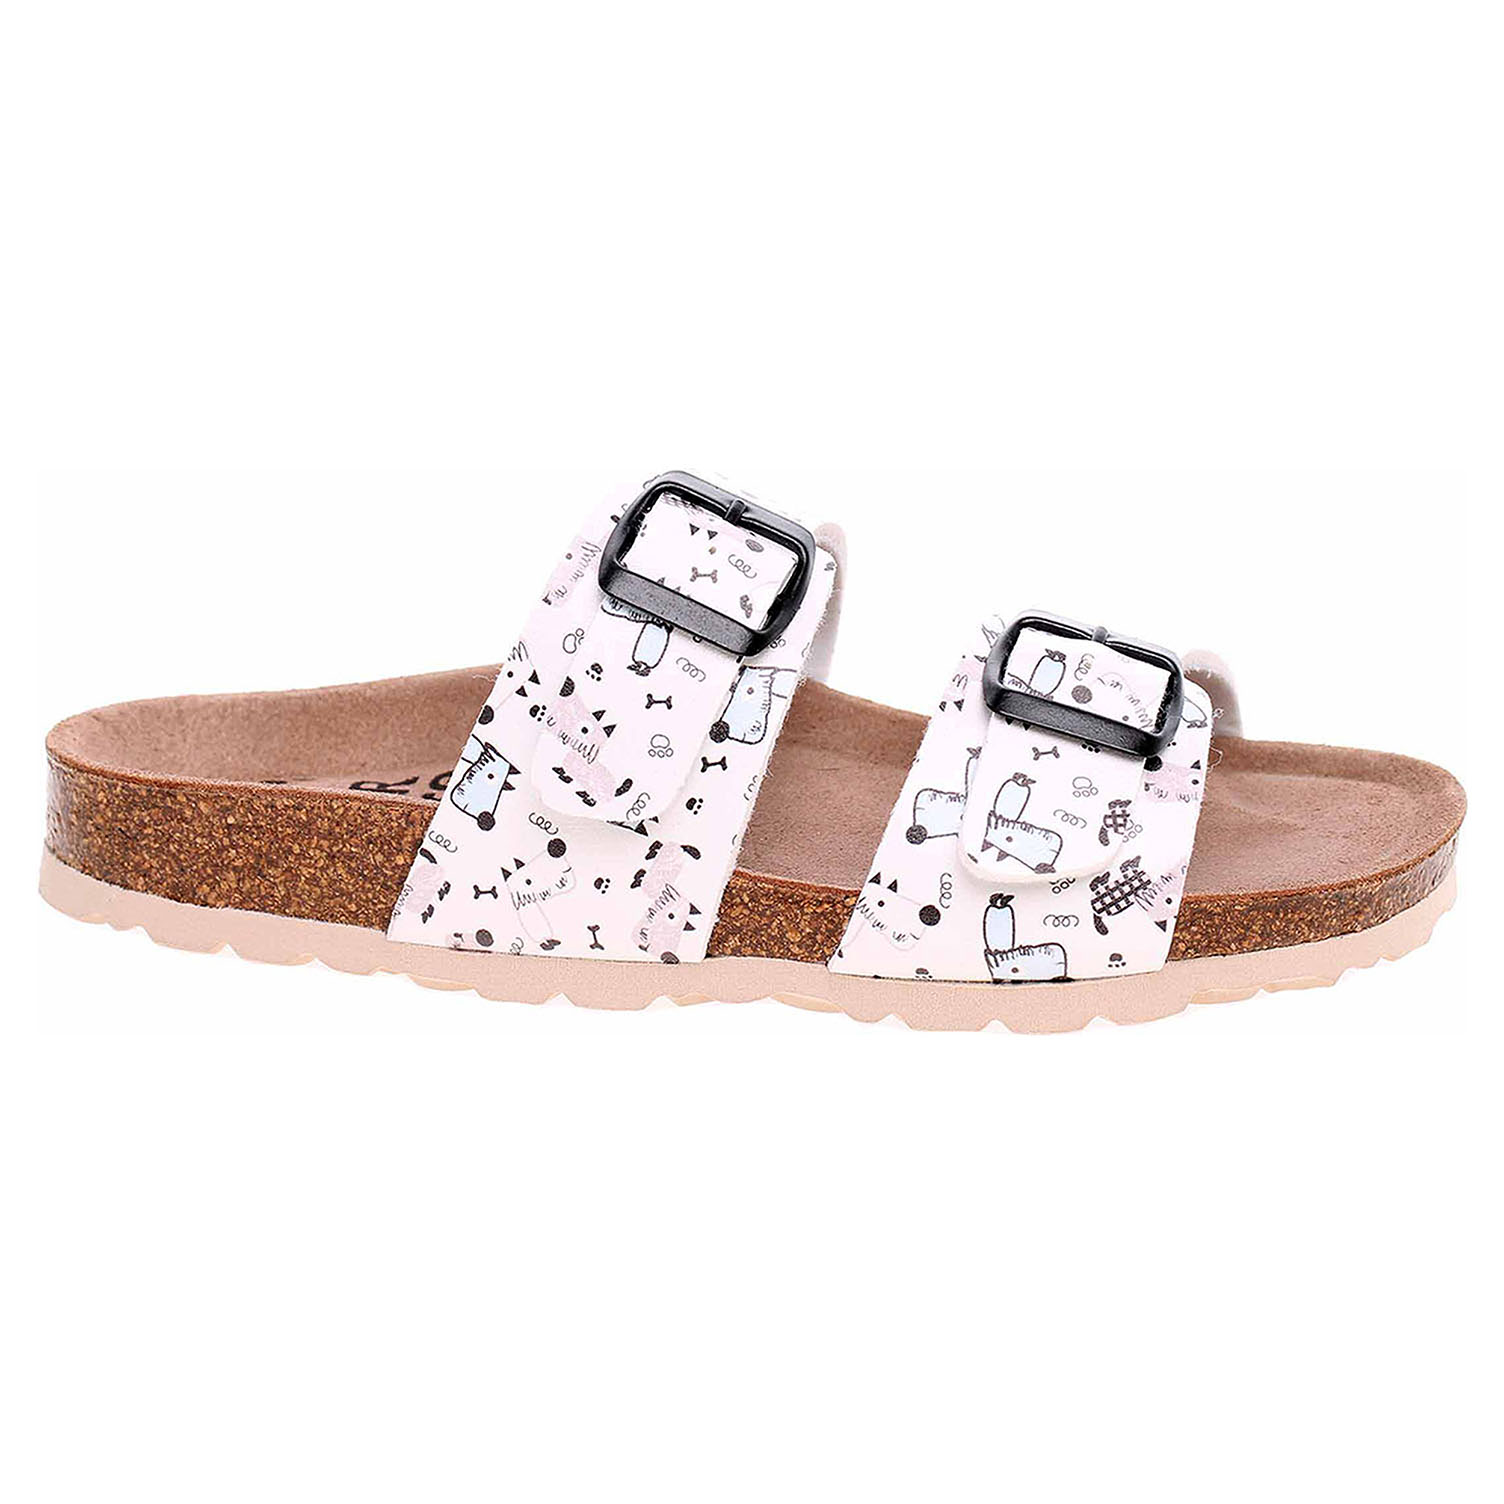 Dámské pantofle Forcare 203015 bílá-multi 203015 bílá/multi 39